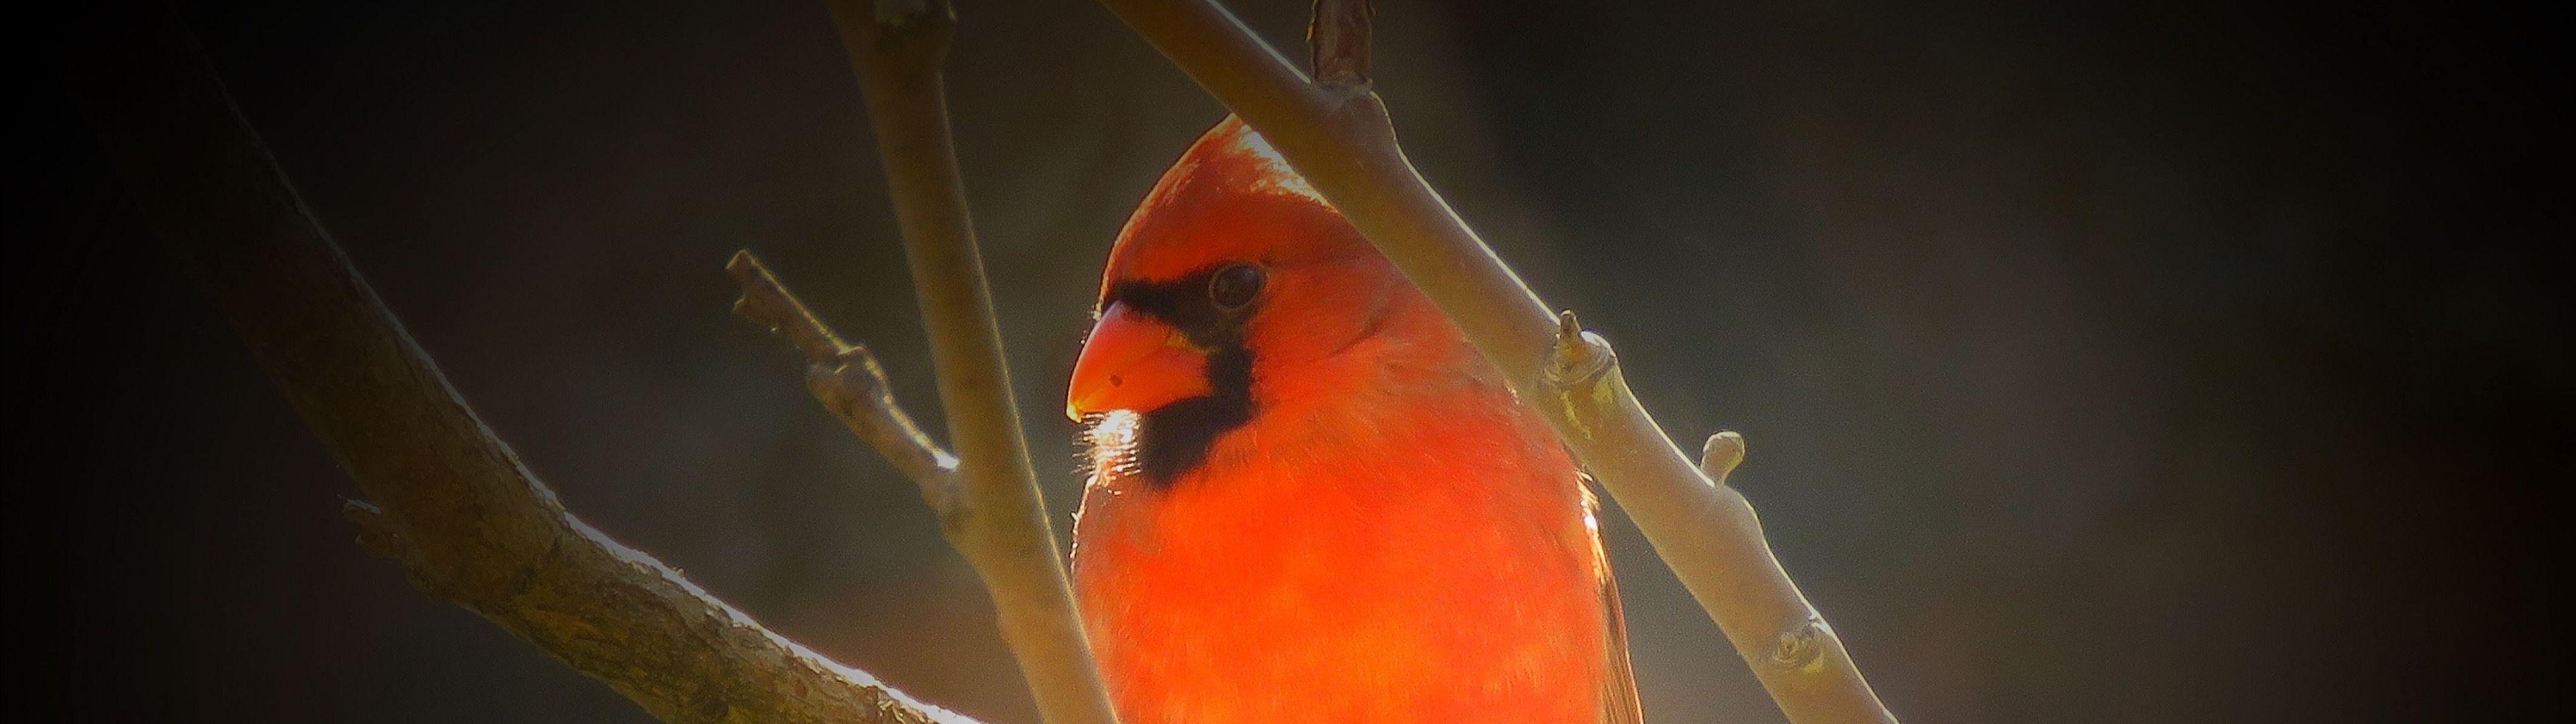 WallpaperFusion-male-northern-cardinal-Original-3840x1080.jpg